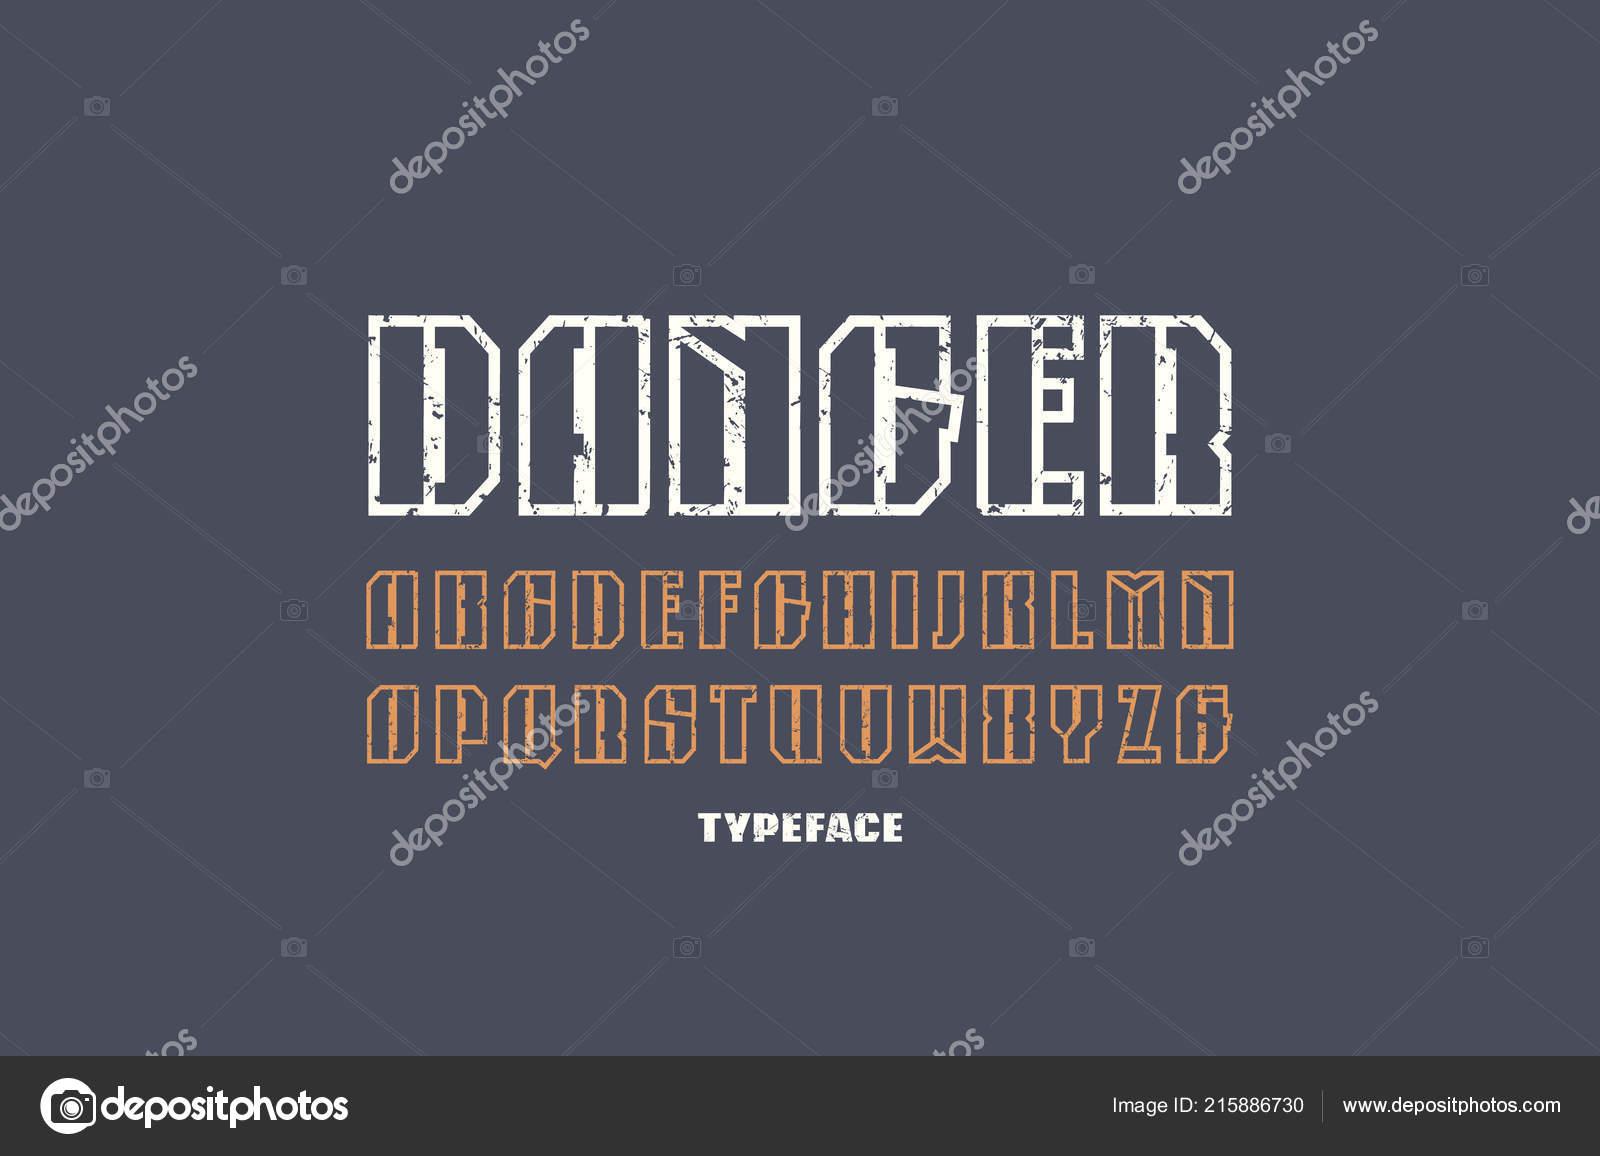 Narrow hollow sans serif font military style letters vintage texture stock vector